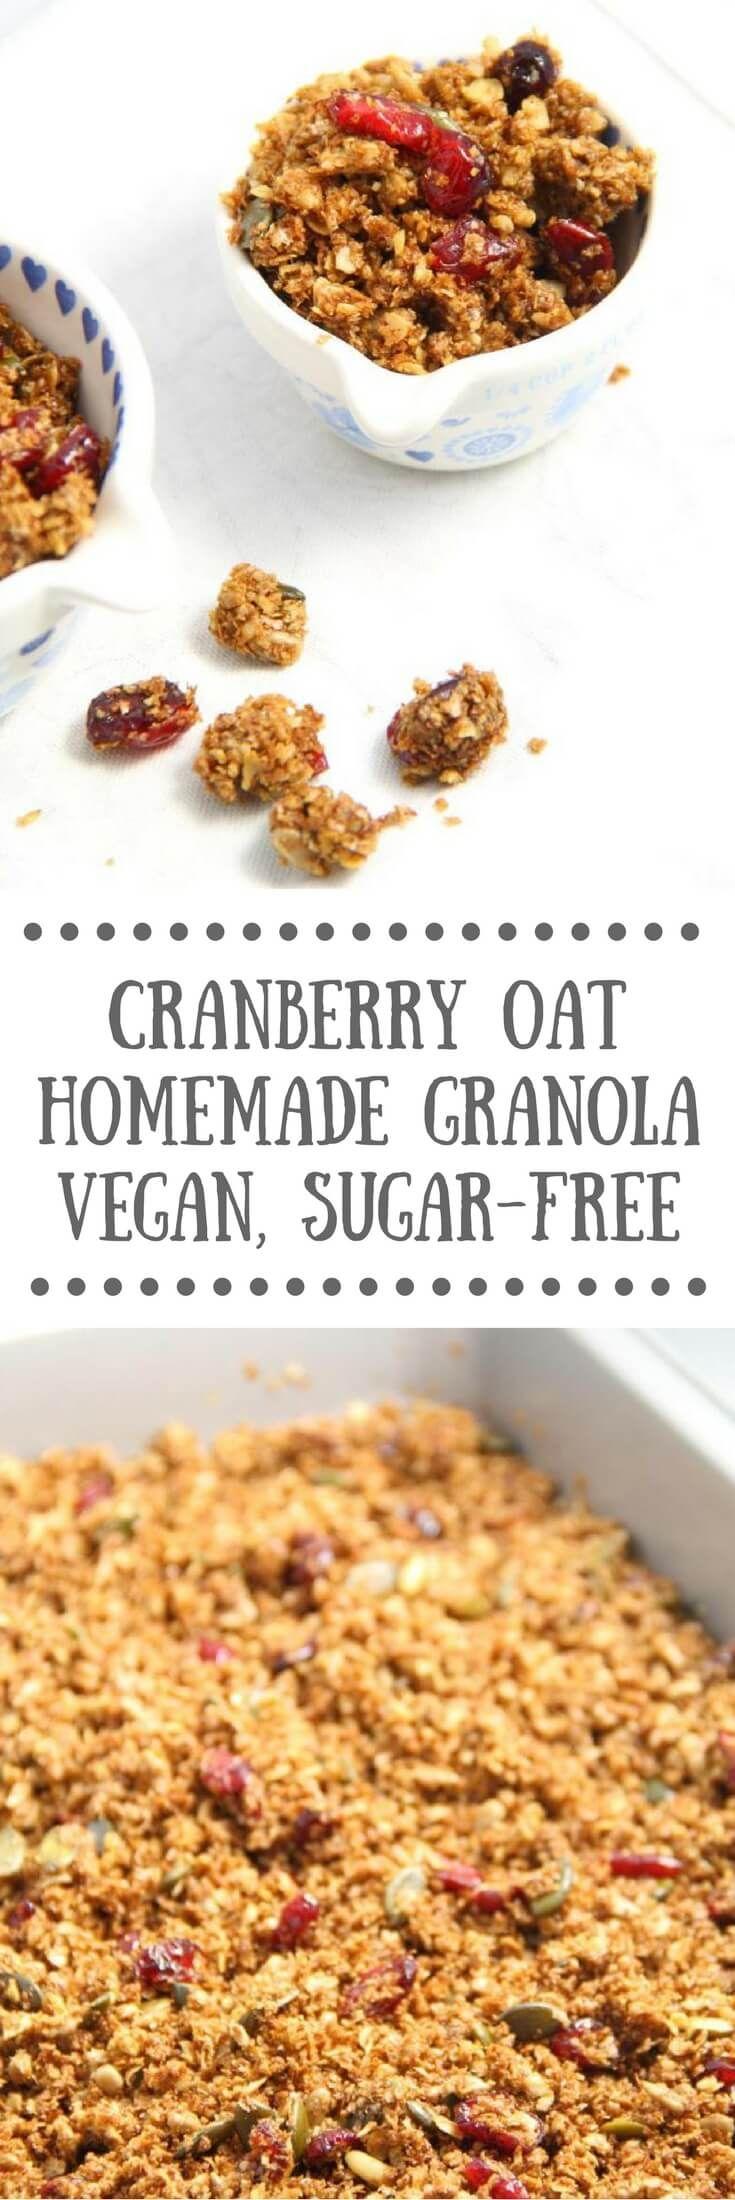 Cranberry Oat Homemade Granola | Vegan, sugar-free breakfast recipe